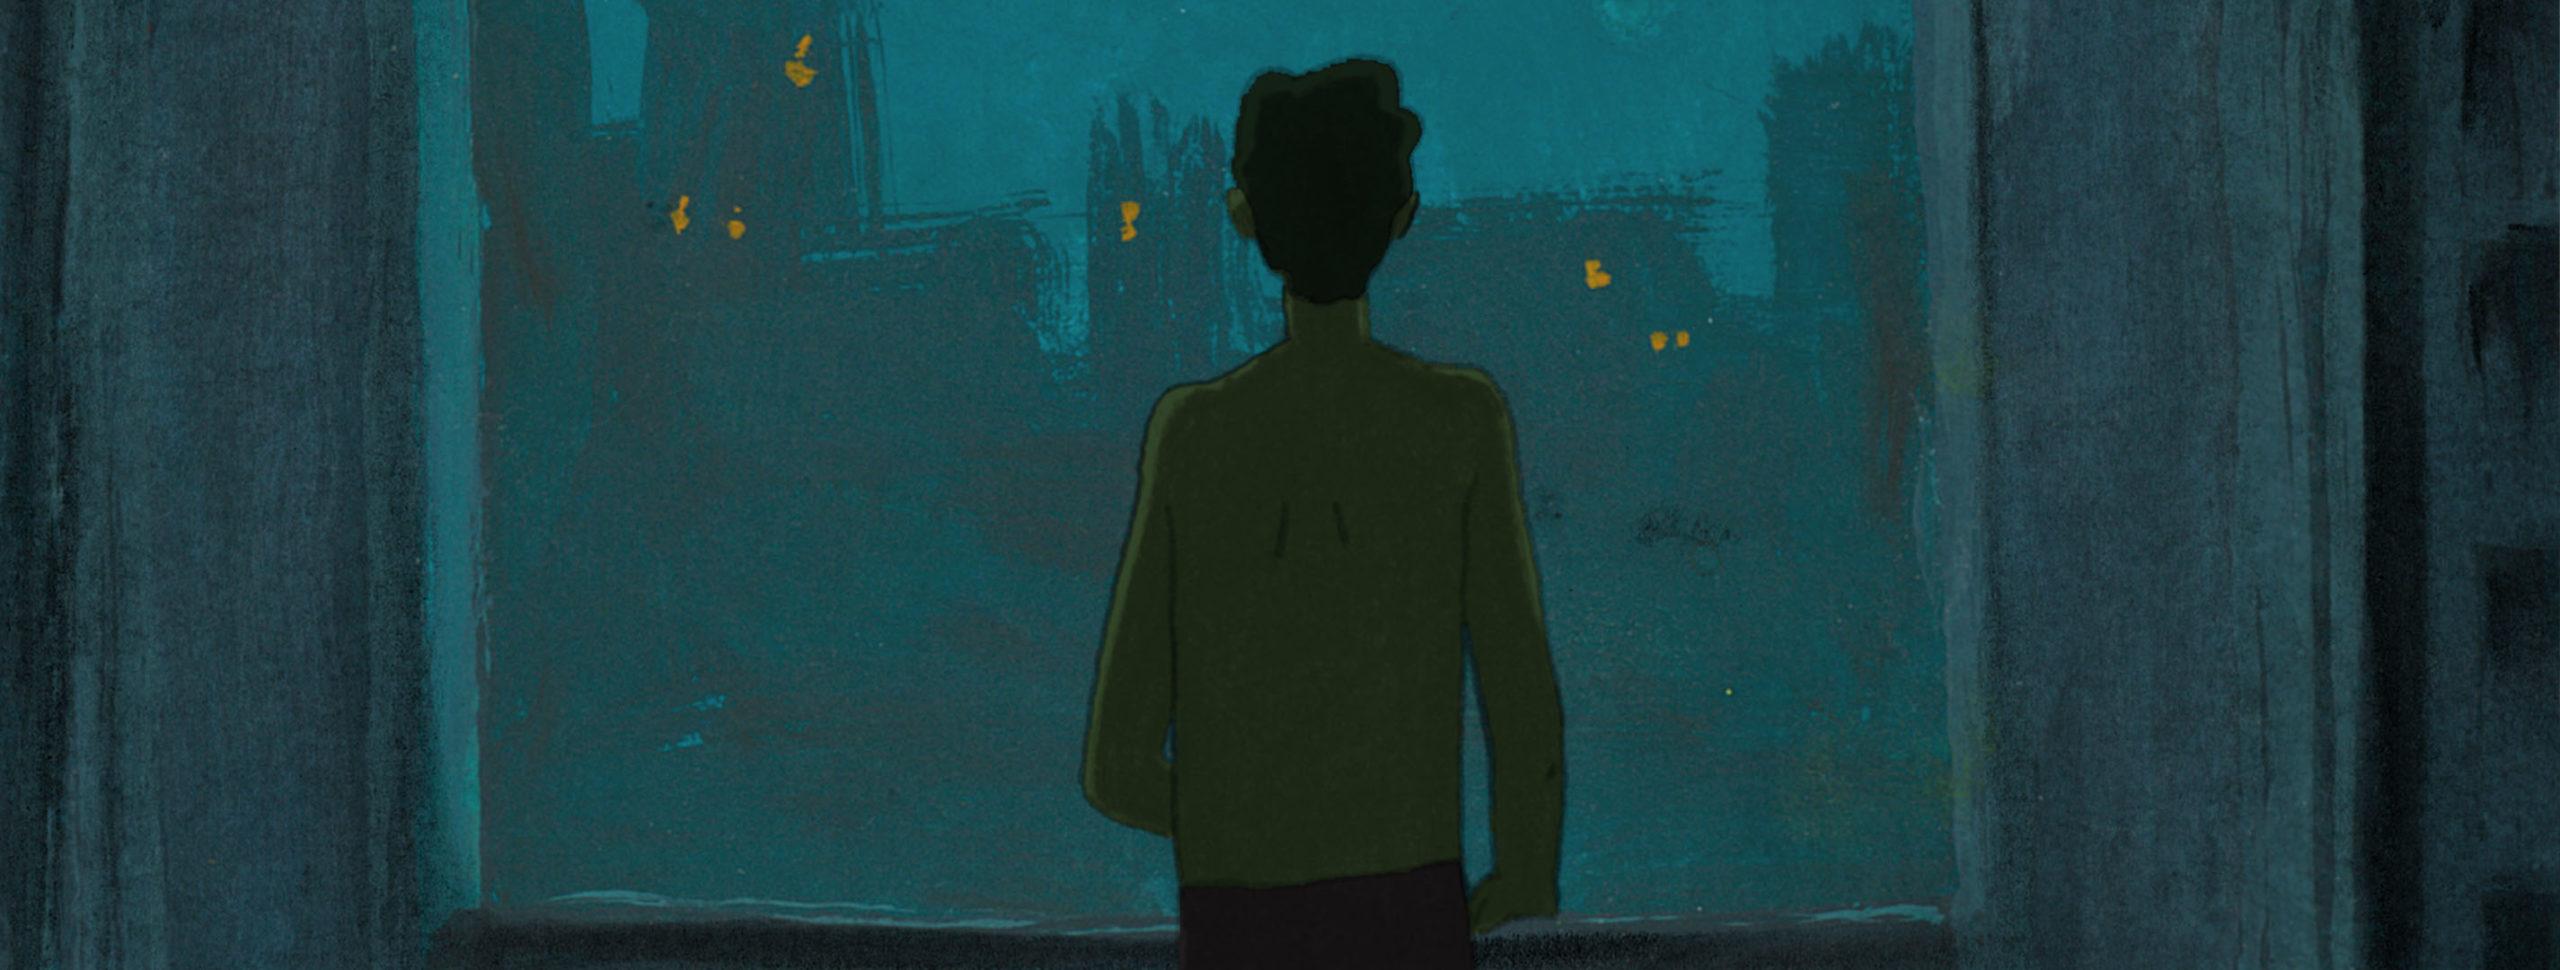 Spécialisation cinéma d'animation